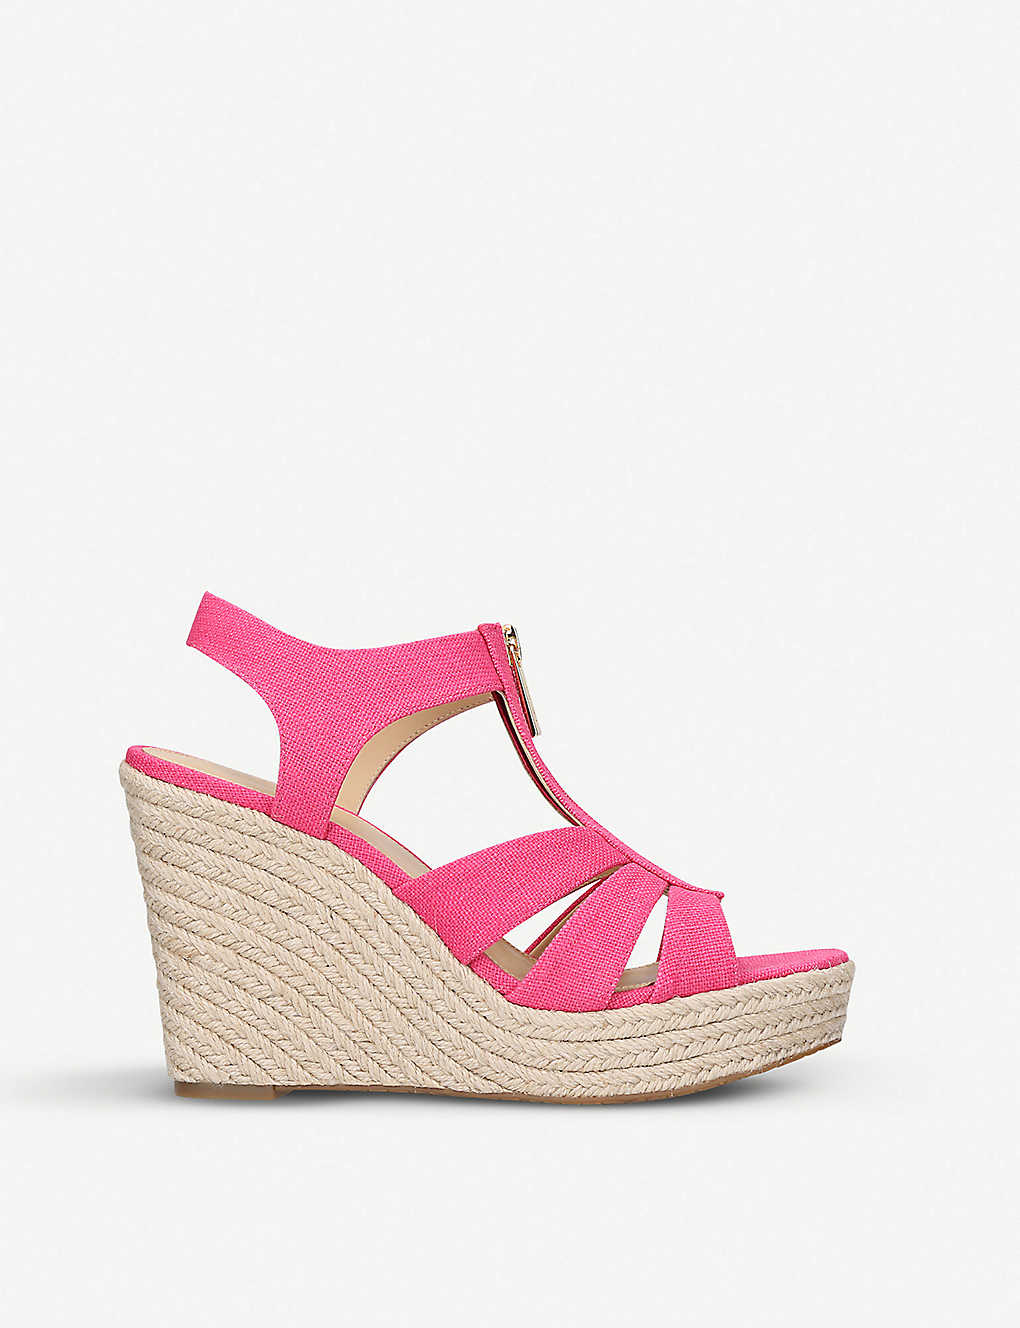 9adb844cf6e8 MICHAEL MICHAEL KORS - Berkley jute-wedge sandals